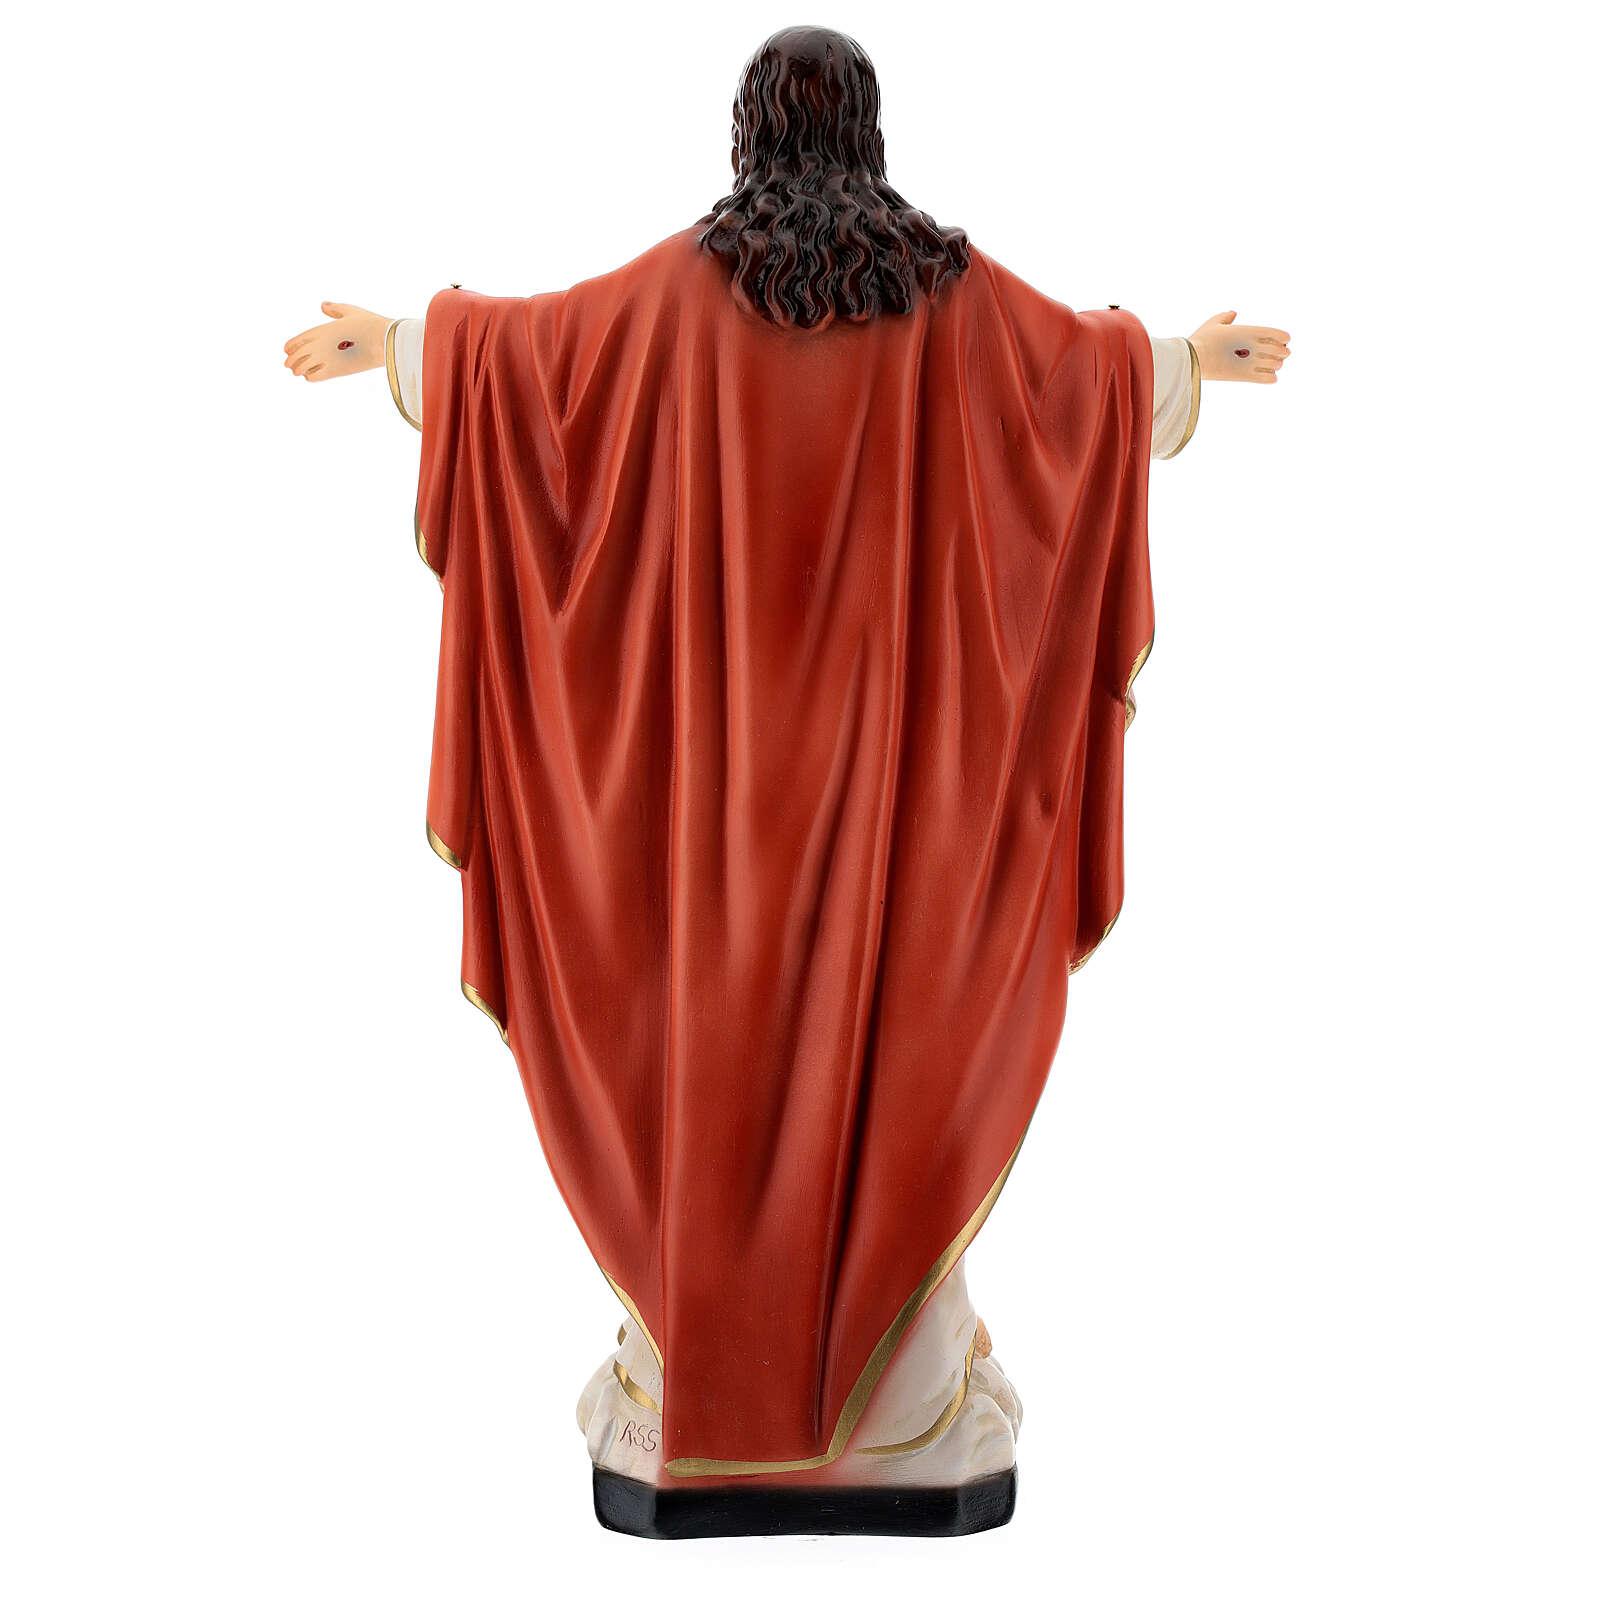 Estatua Jesús Sagrado Corazón brazos abiertos 40 cm resina pintada 4